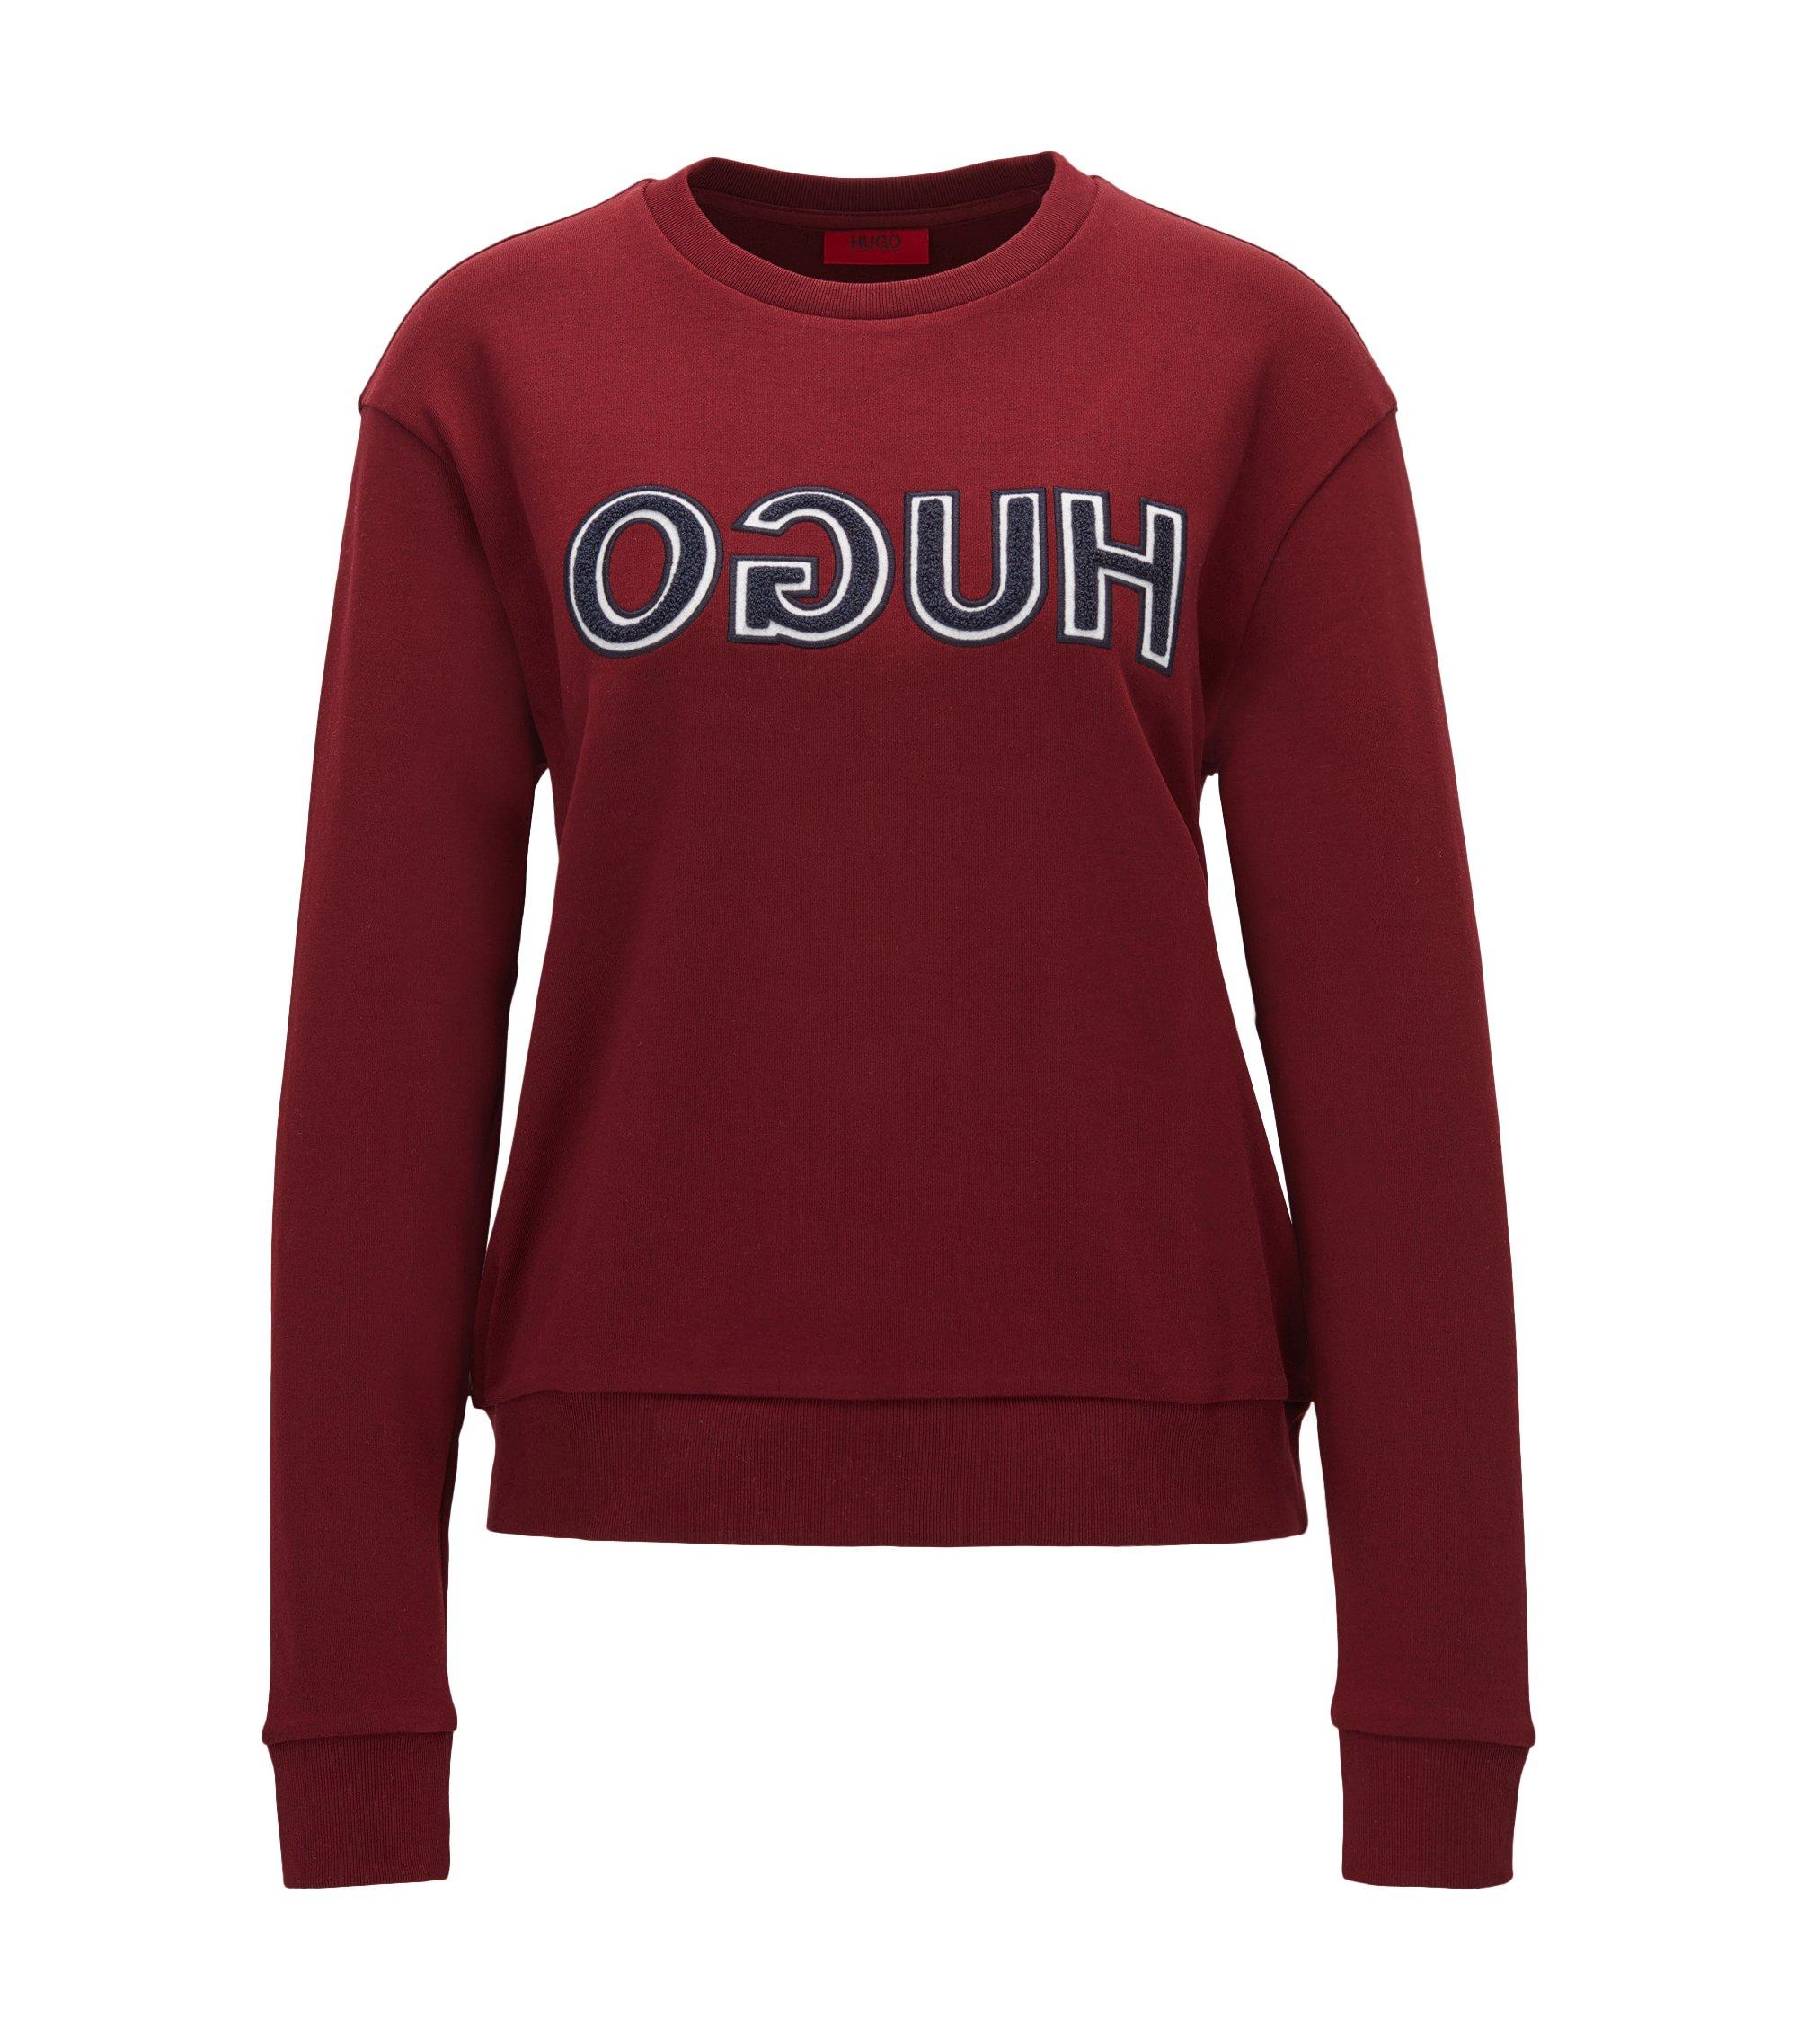 Camiseta de manga larga en algodón con un logo invertido de estilo universitario, Rojo oscuro